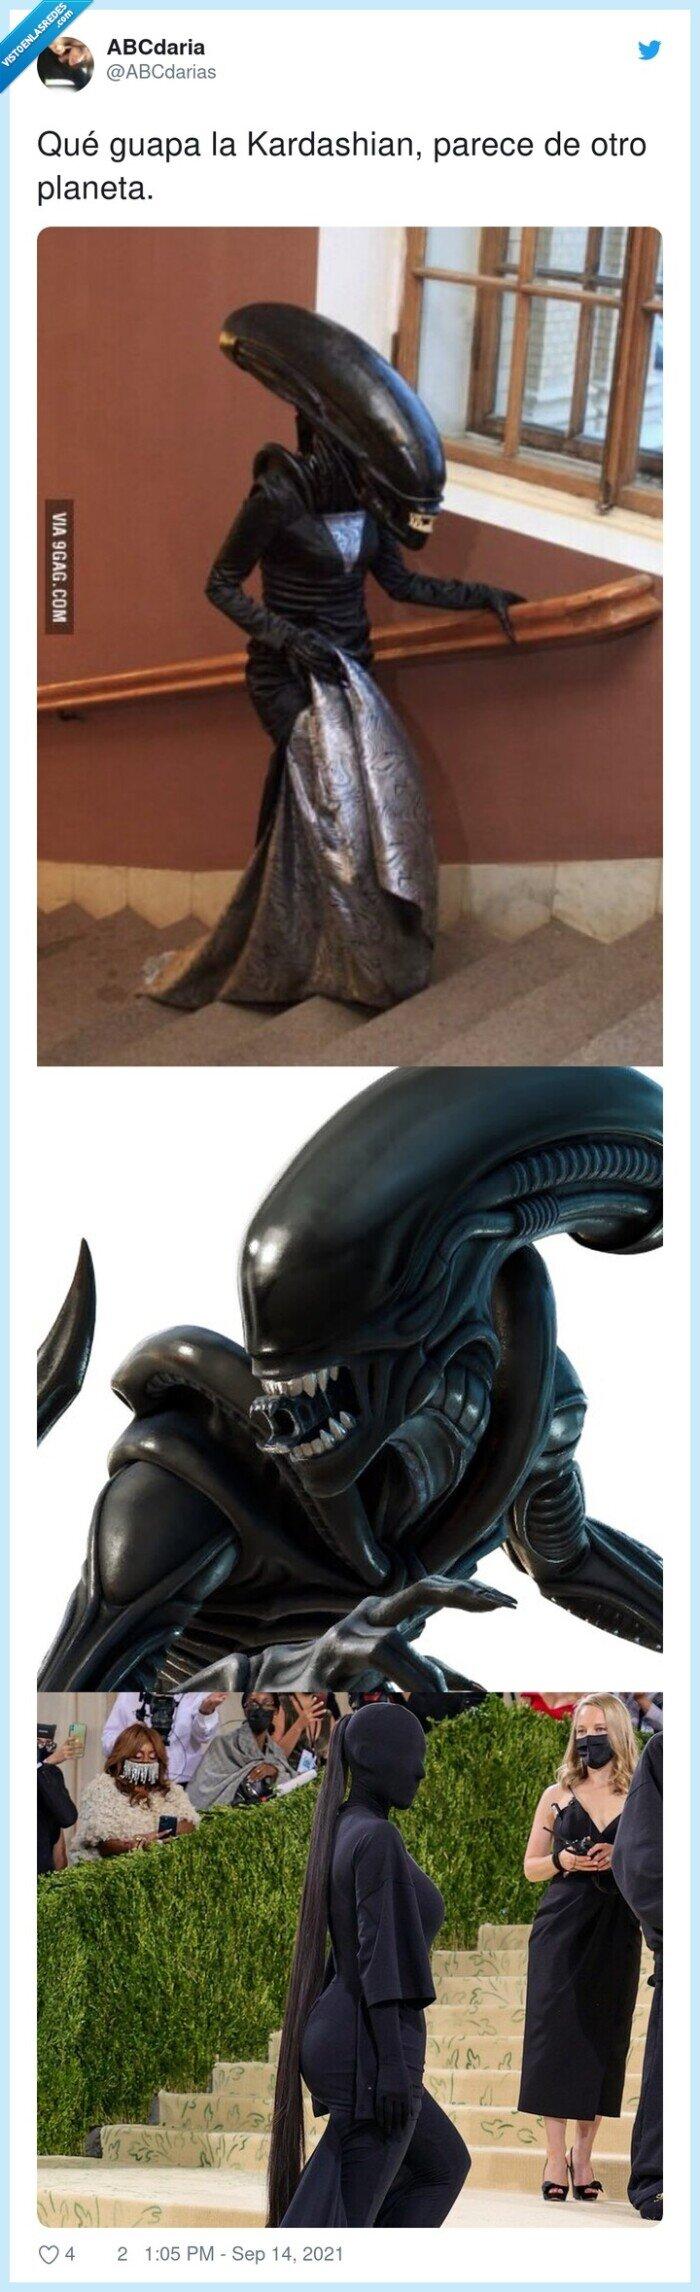 alien,gala,kardashian,met,planeta,tapada